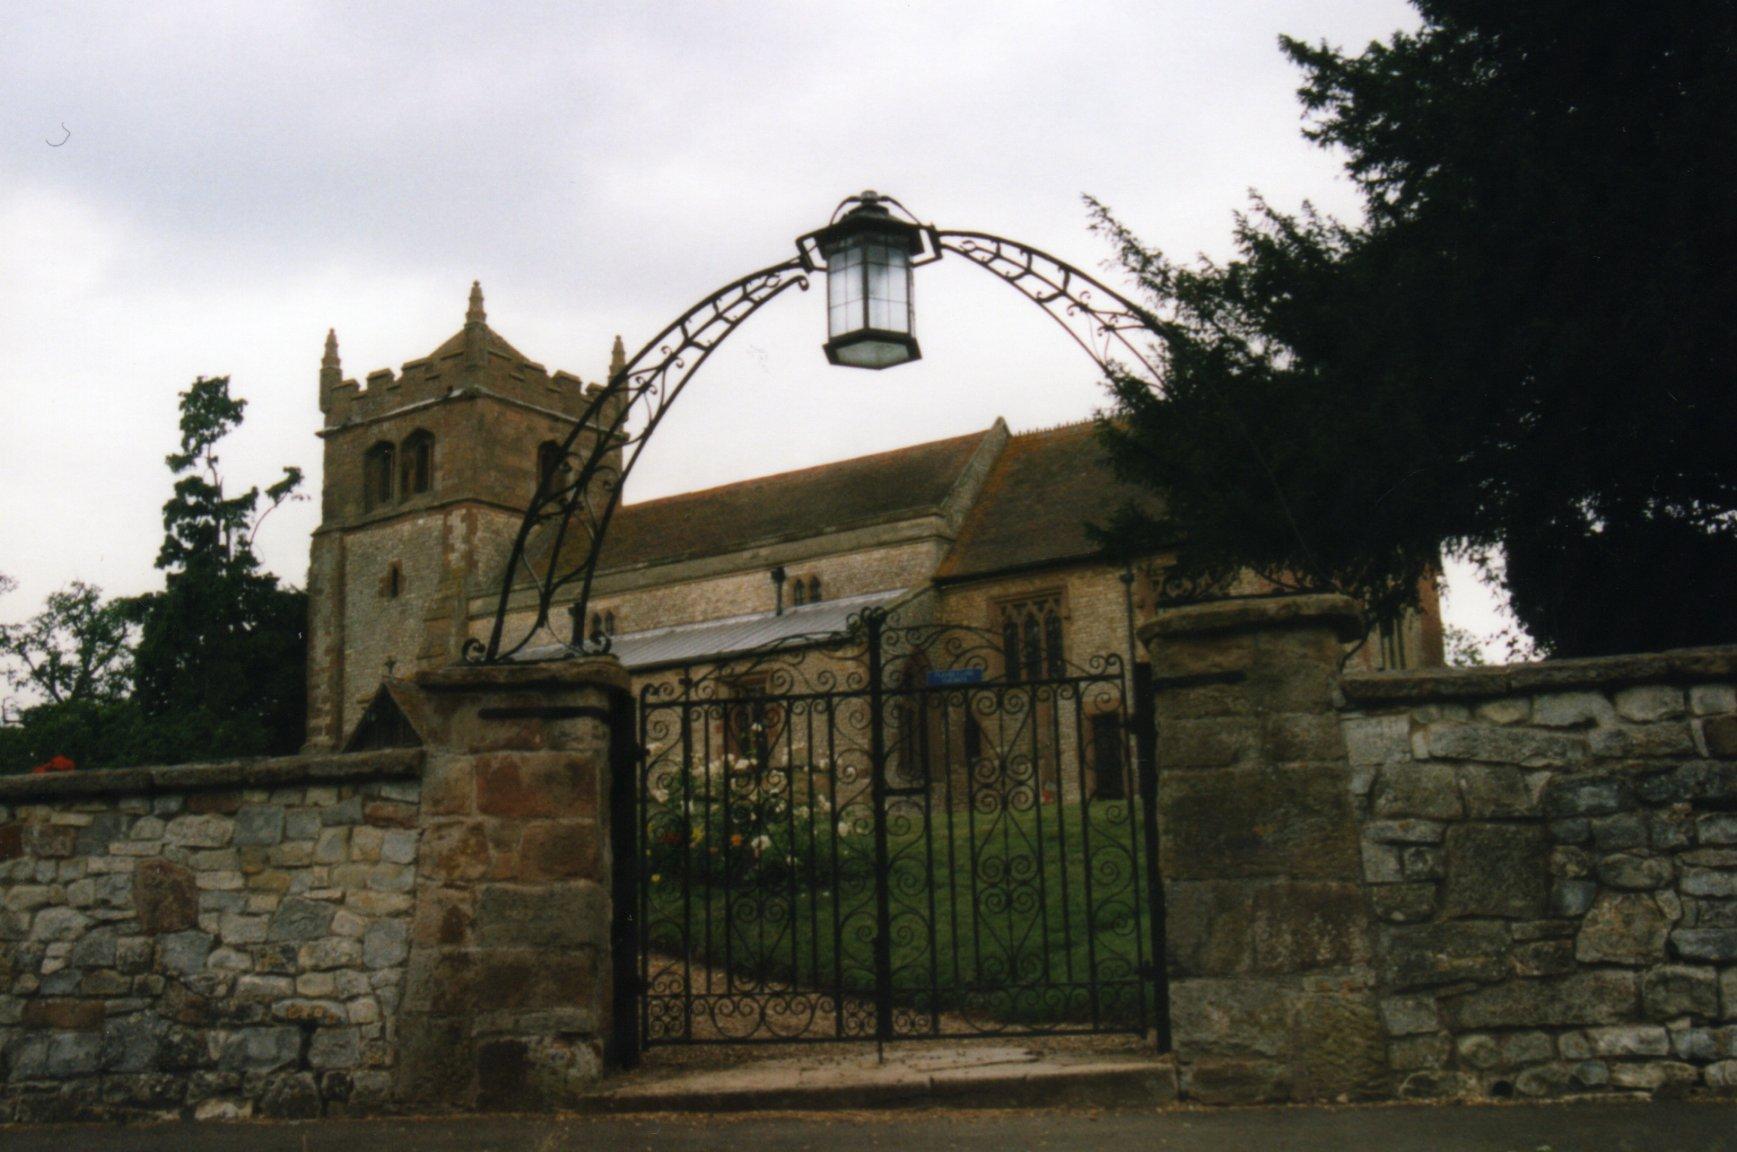 St. Nicholas, Frankton